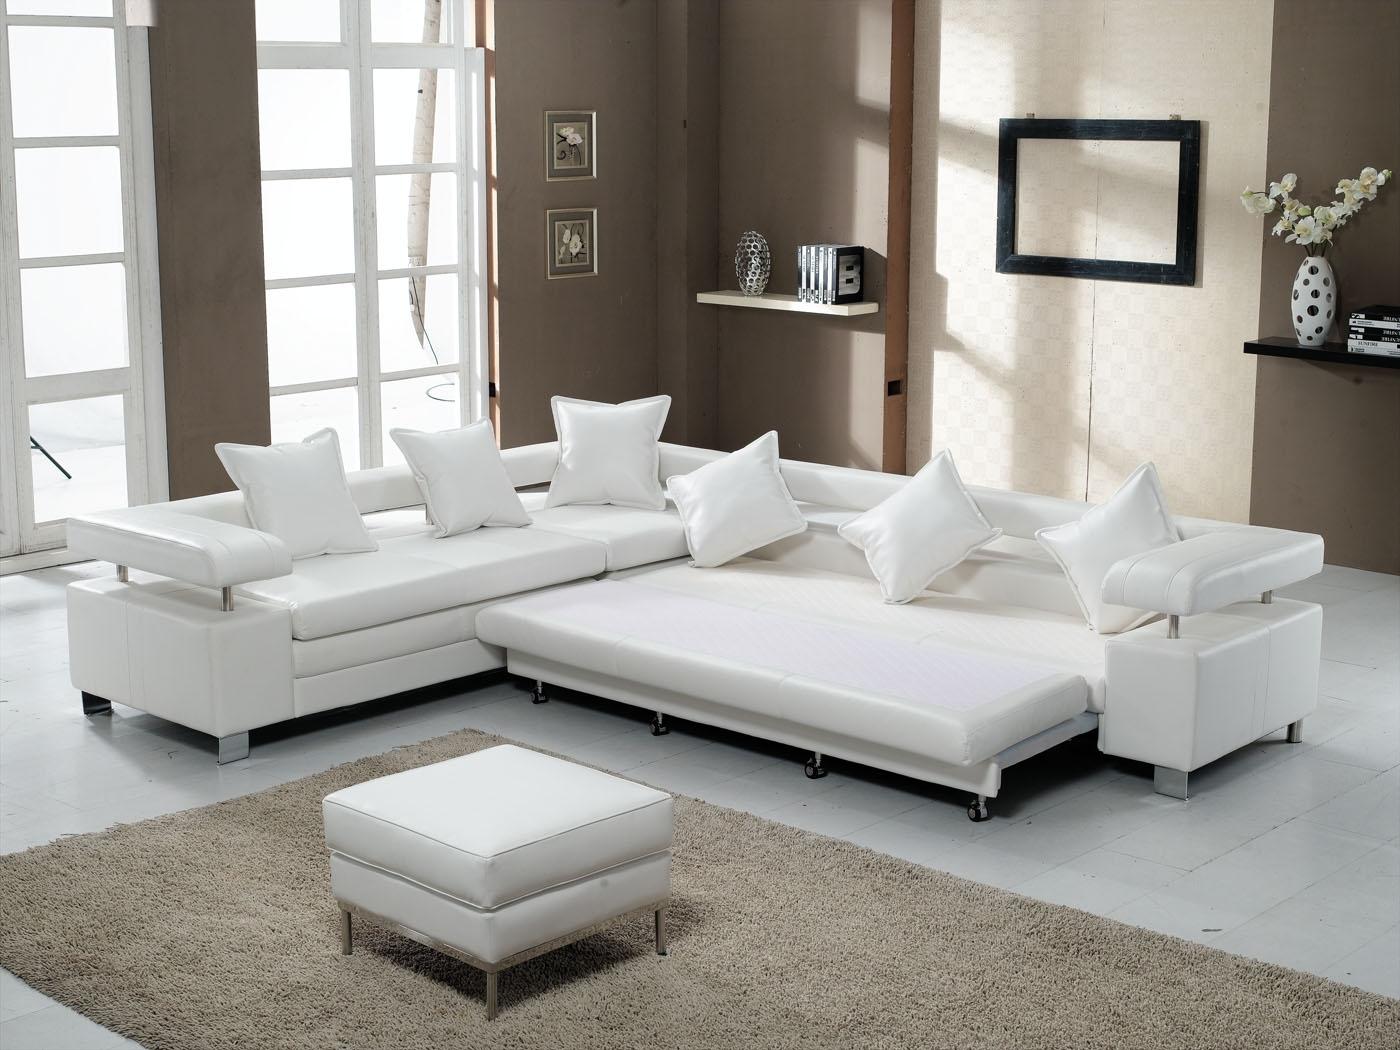 awesome sleeper sofas sofa mart ingram road san antonio tx togo cool blackbrown leather set by